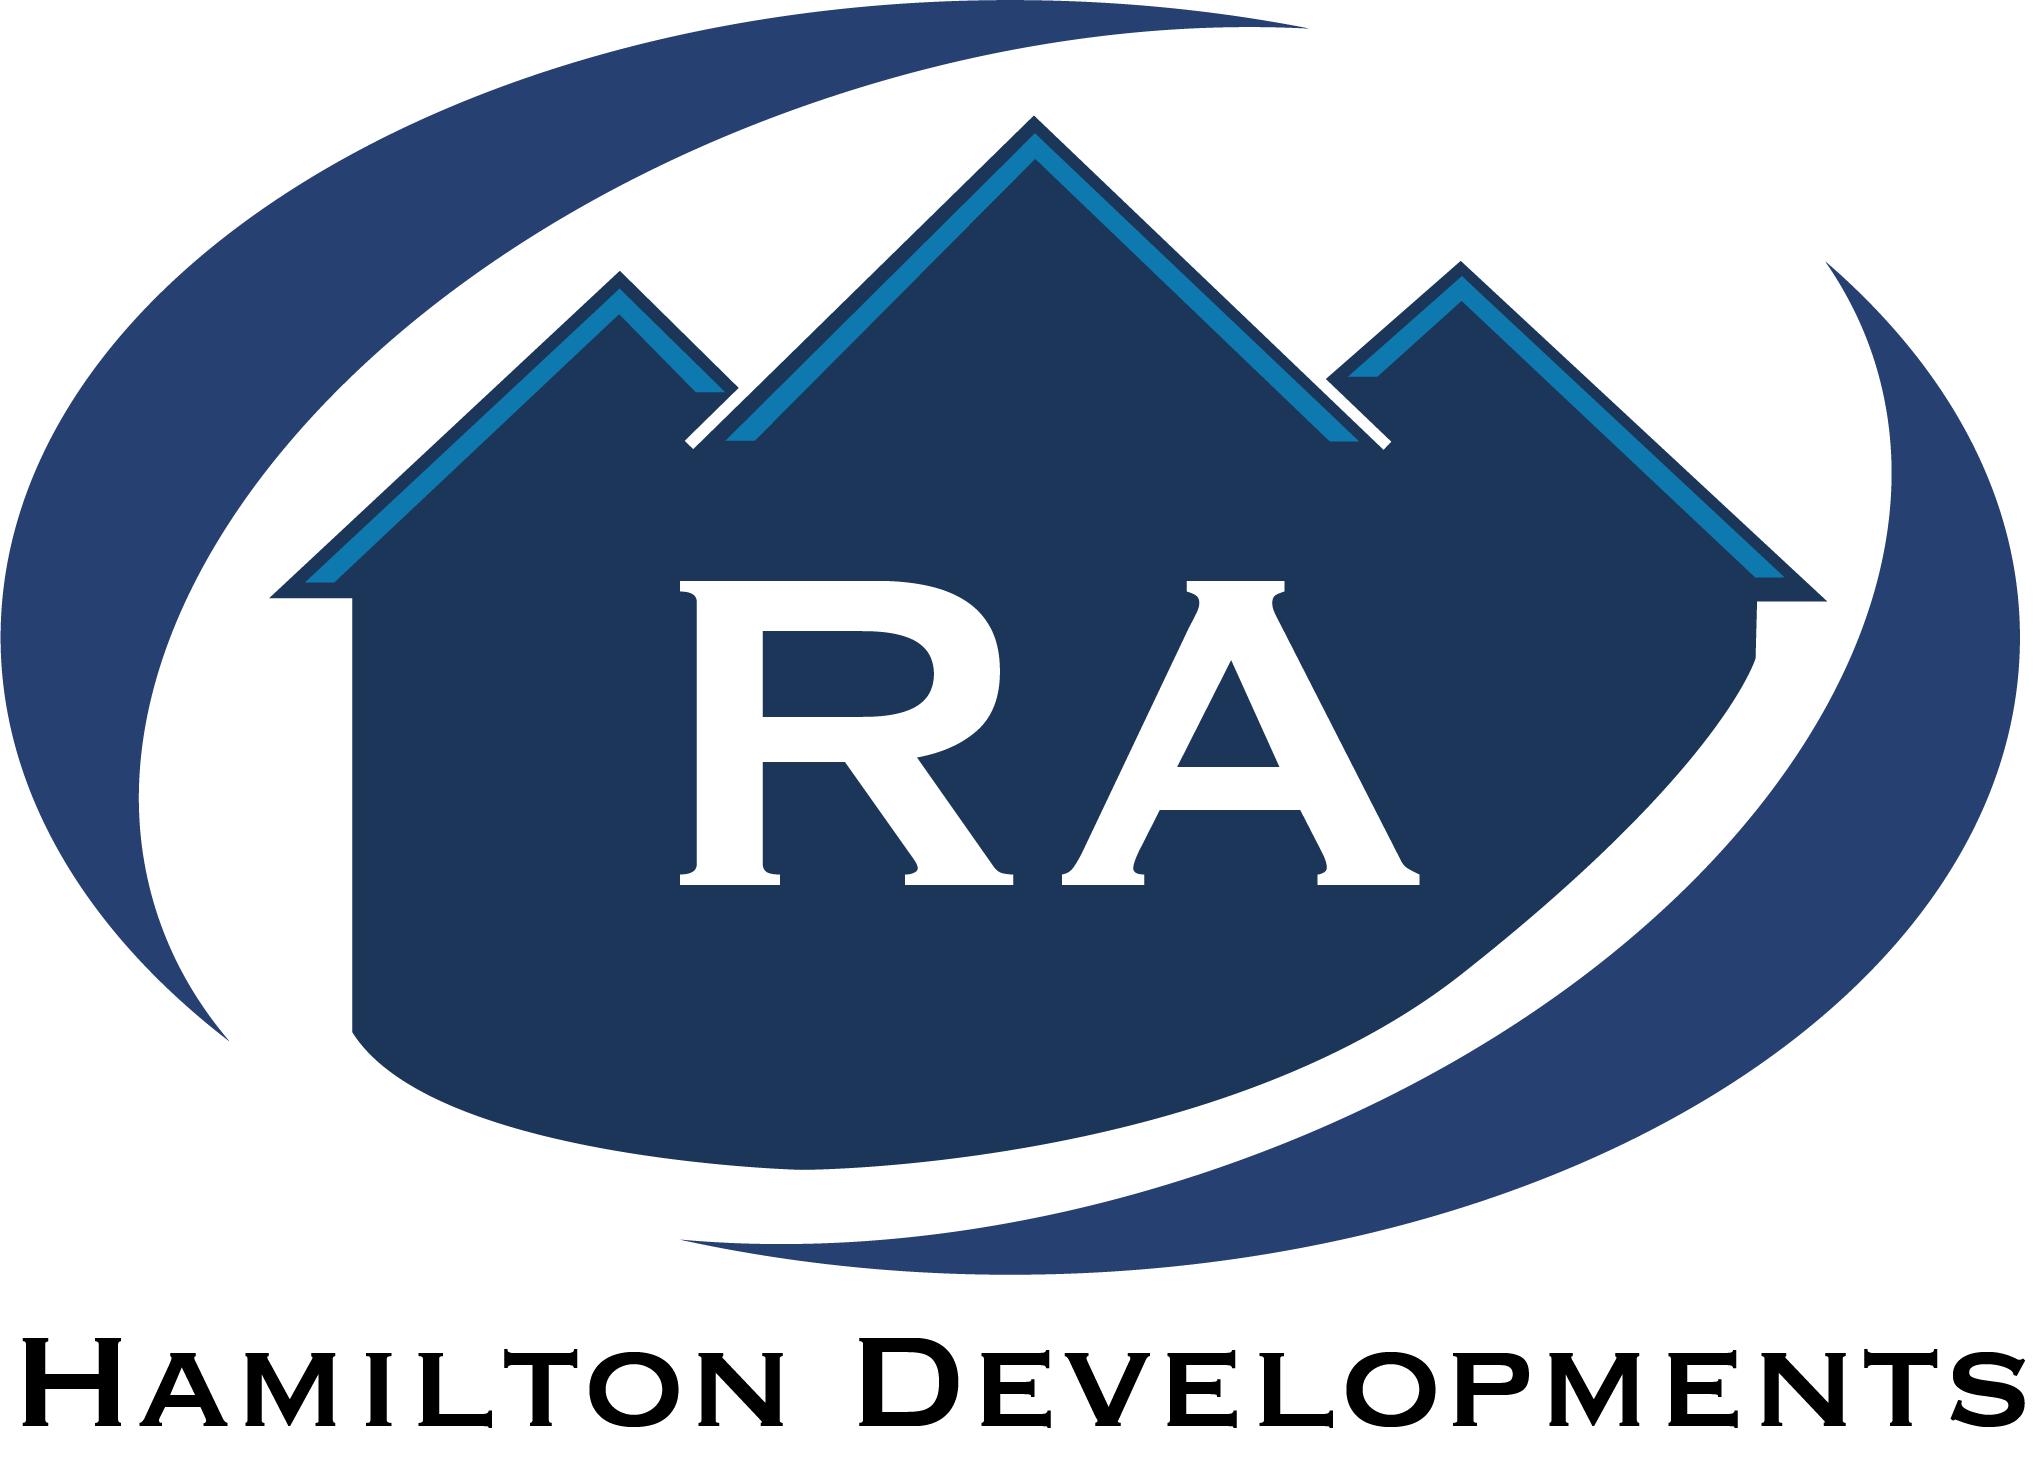 RA Hamilton Developments